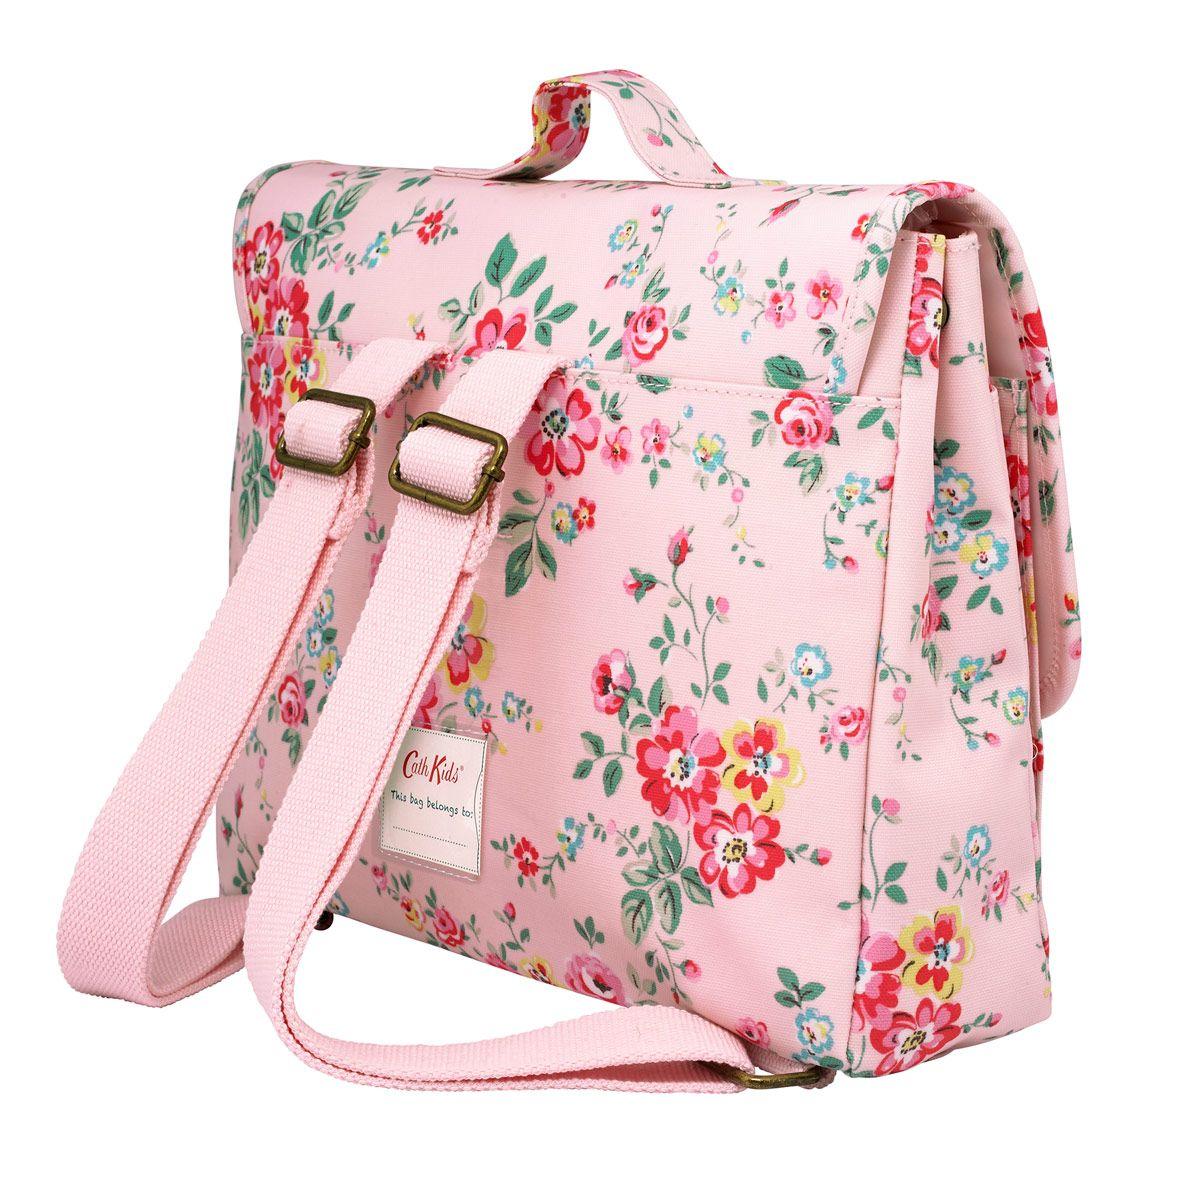 Thorp Flowers Kids Satchel Backpack  47ad5c31b7bb6